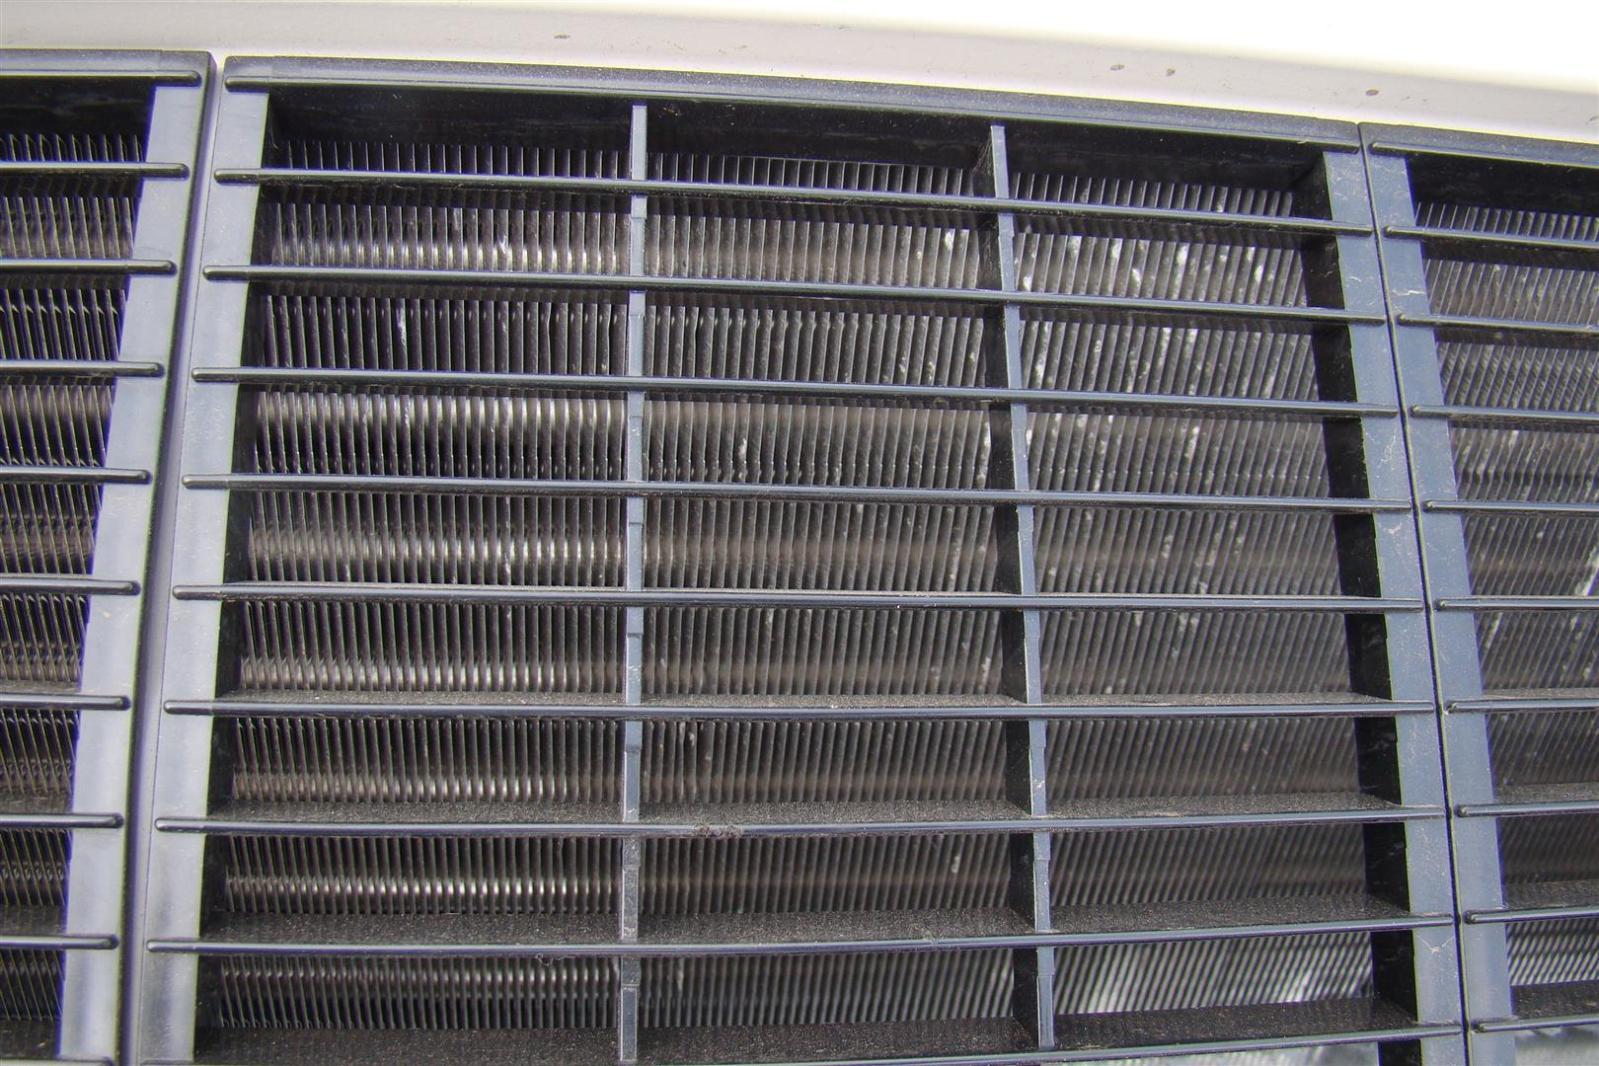 Pump Air Conditioner Size12 RH 555 Vertical Cabinet Size 800 T11F3515 #575E74